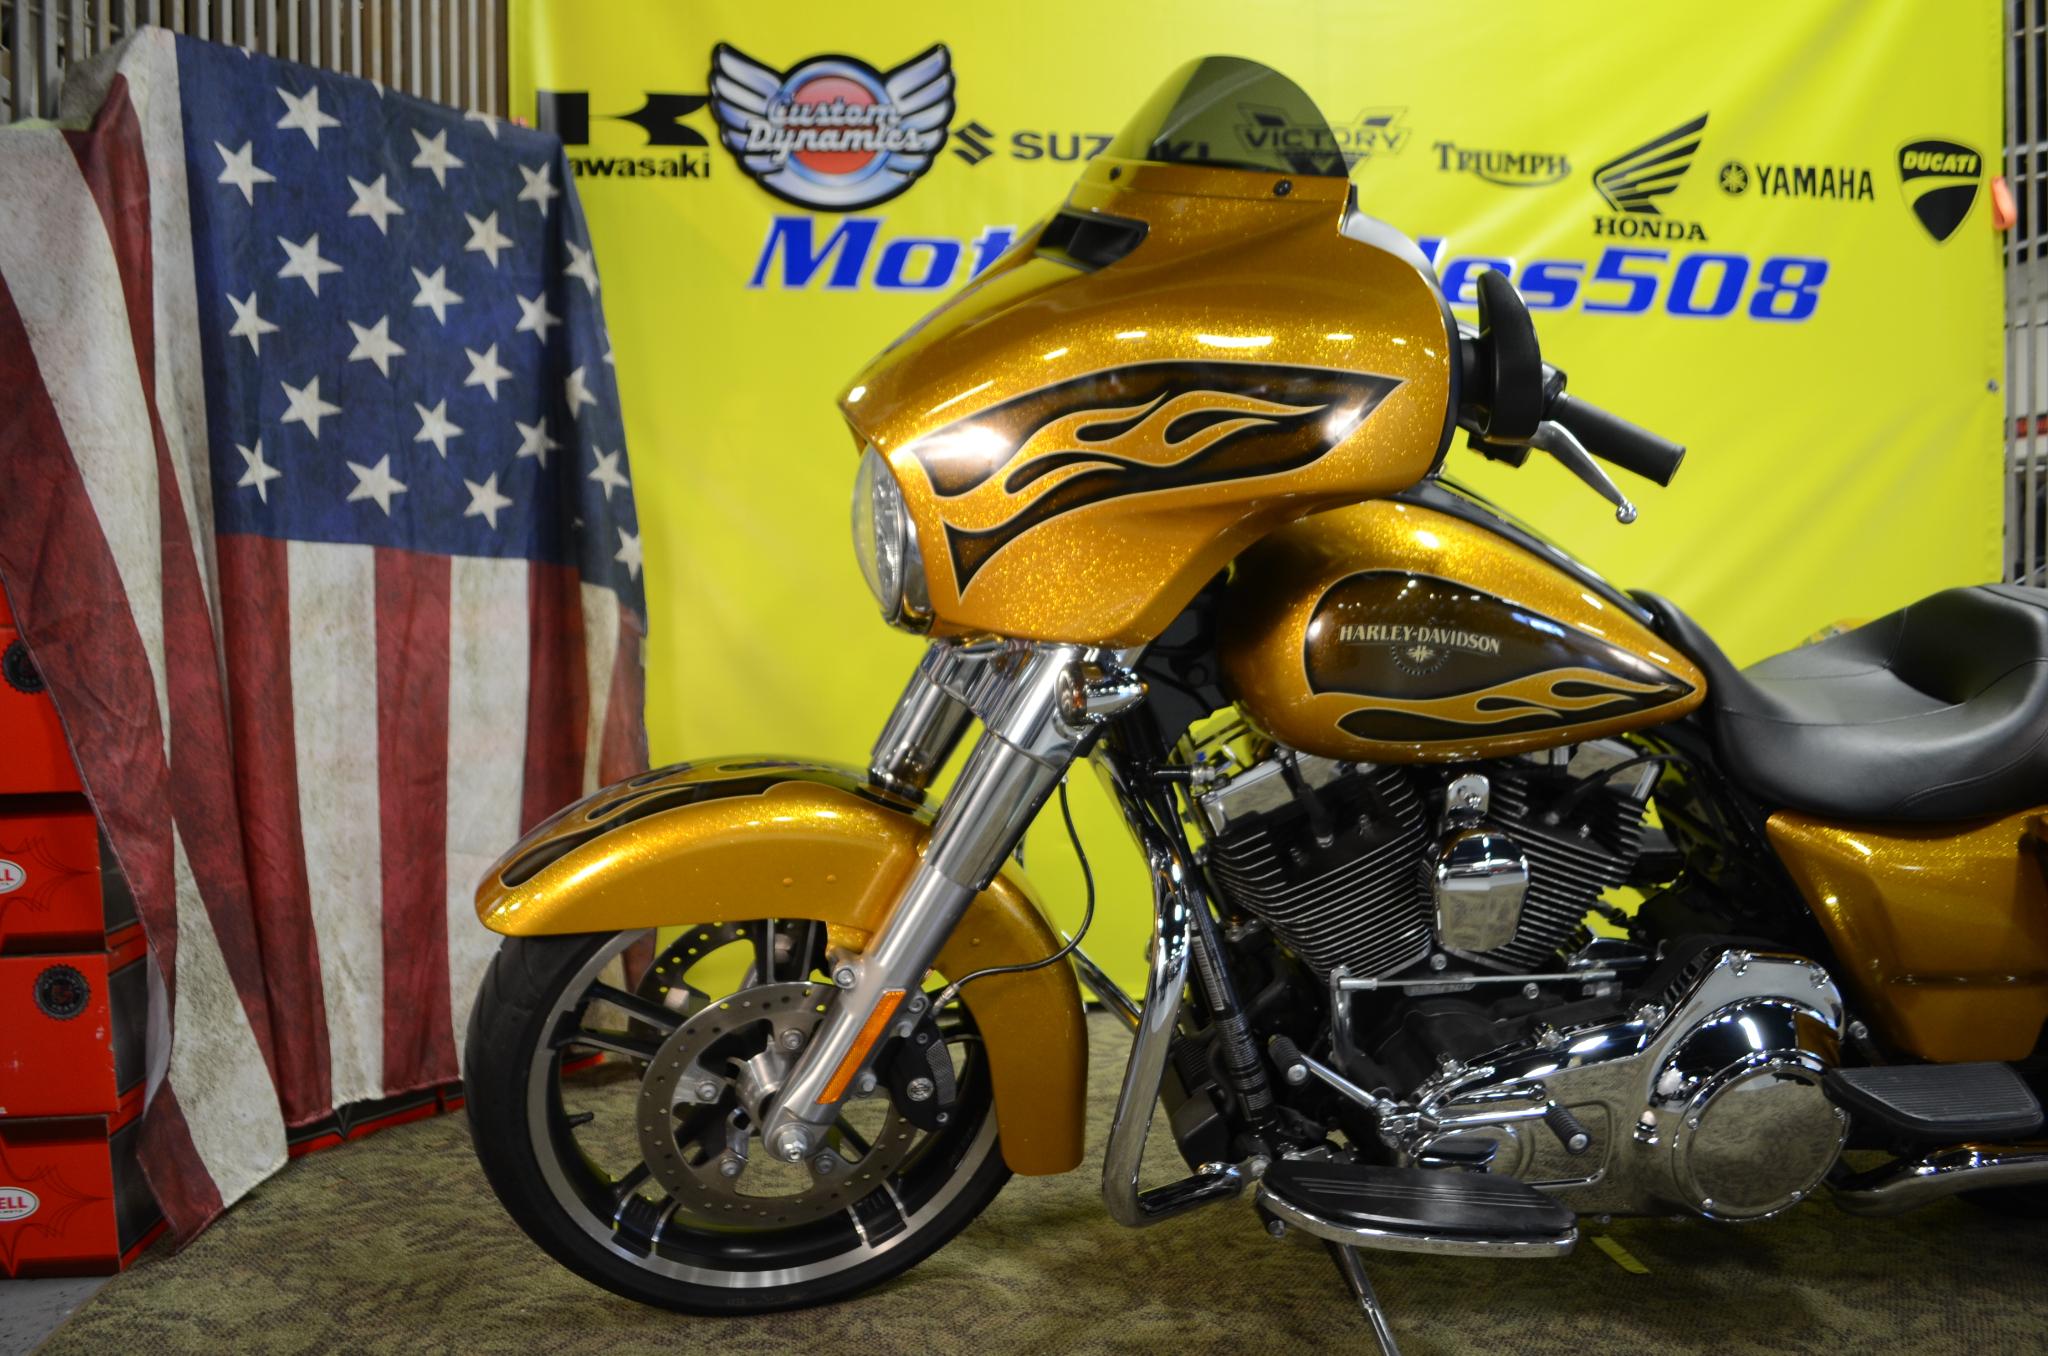 2016 Harley-Davidson Street Glide FLHX